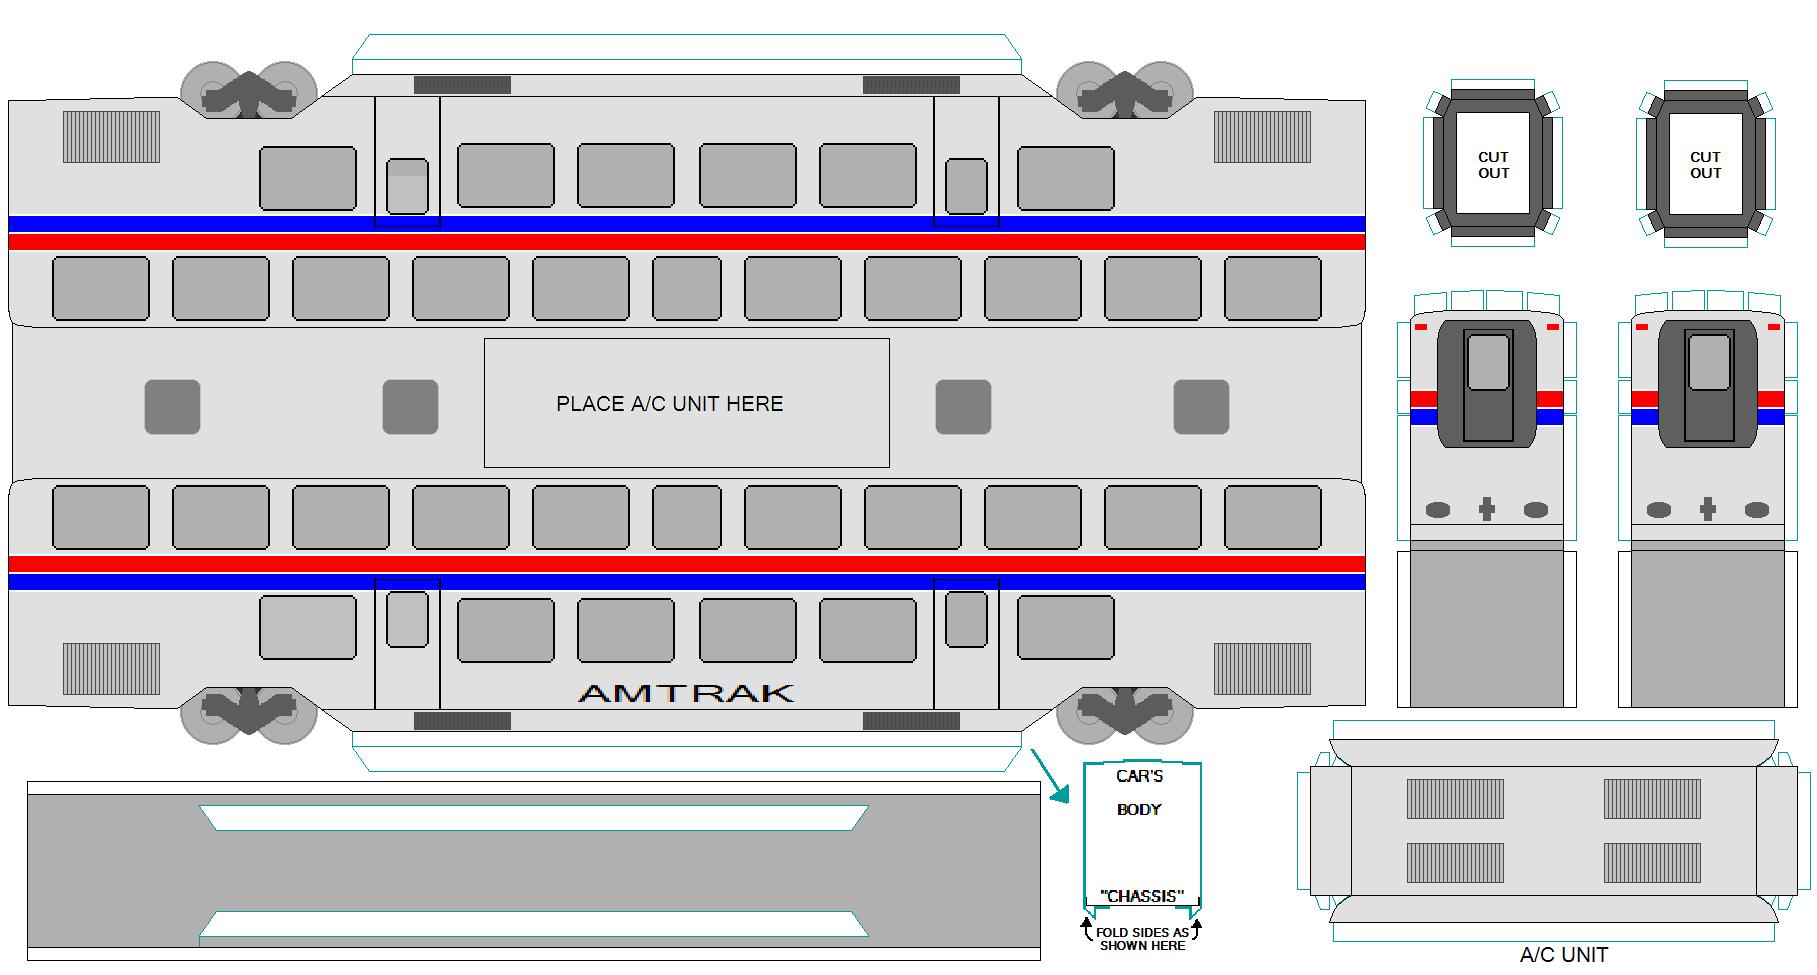 bi_level_train_car_Amtrak_80__sColors.PNG